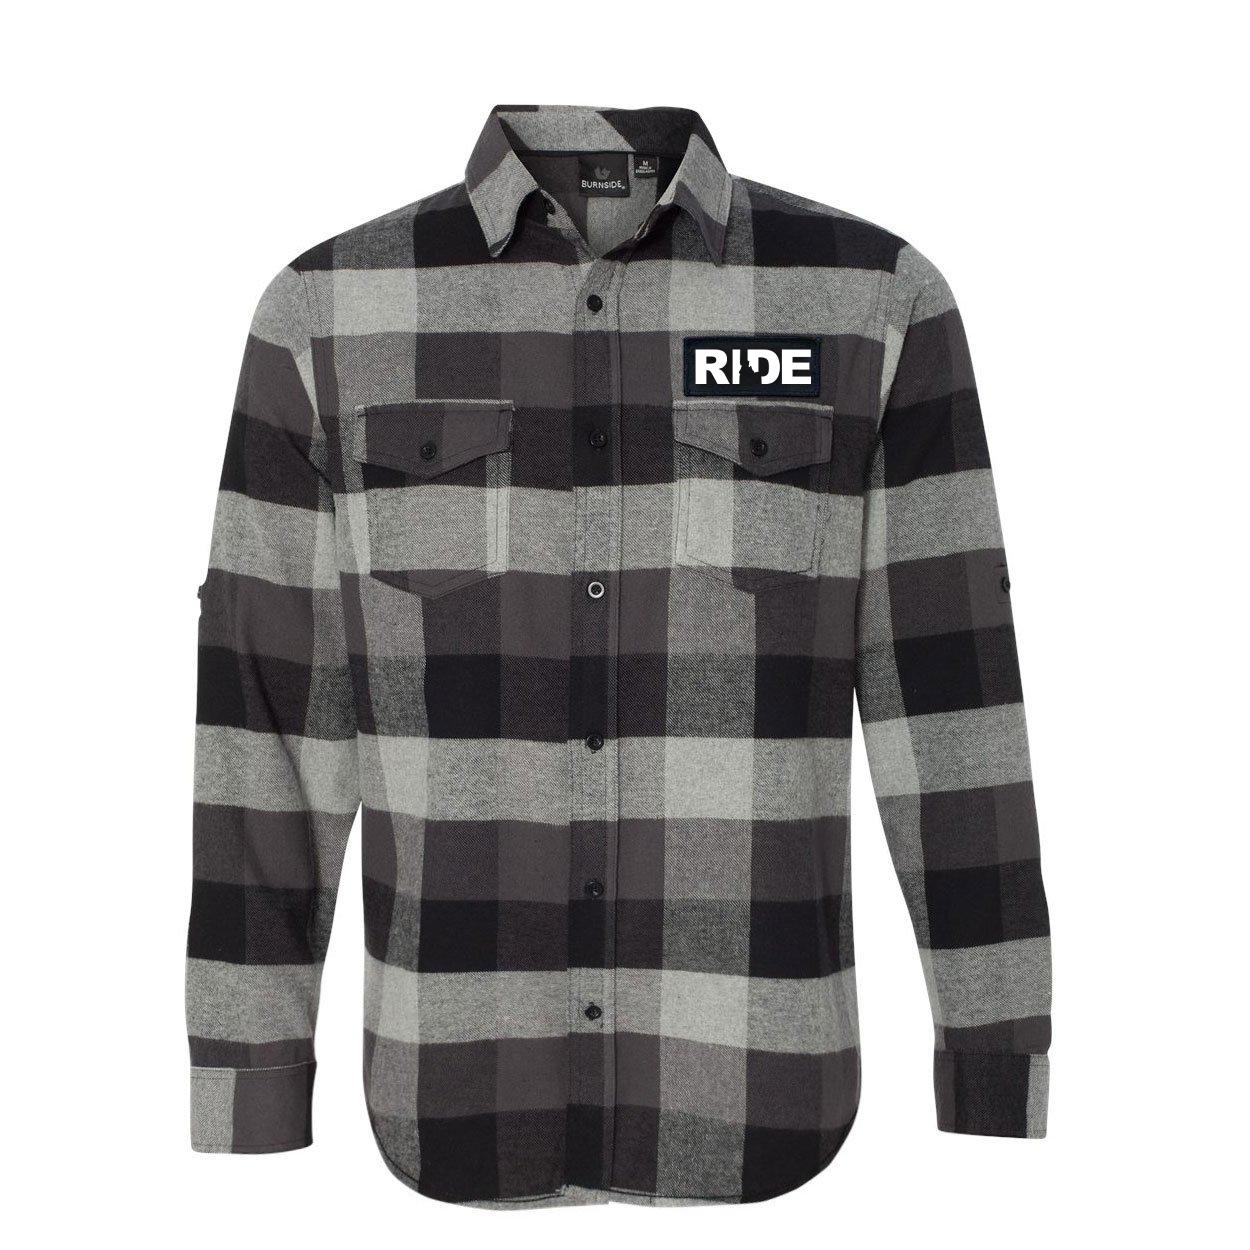 Ride Idaho Classic Unisex Long Sleeve Woven Patch Flannel Shirt Black/Gray (White Logo)